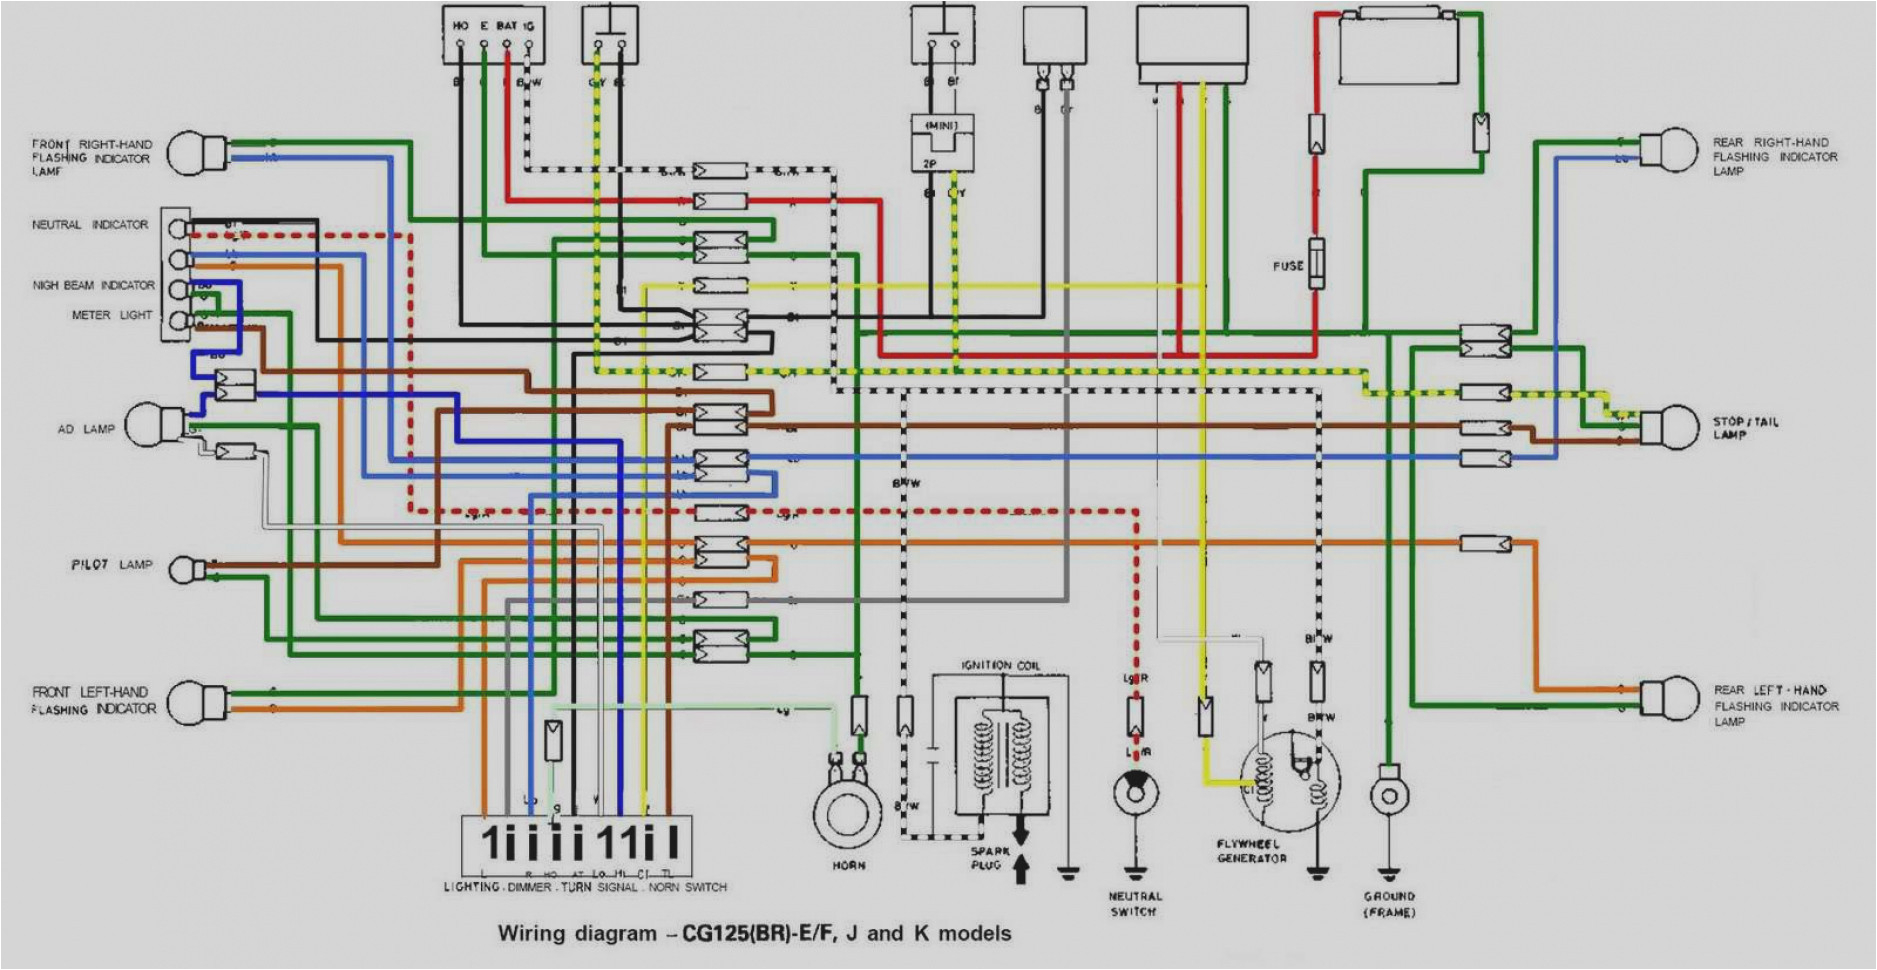 xrm electrical diagram wiring diagram view honda xrm 125 electrical wiring diagram honda xrm electrical diagram